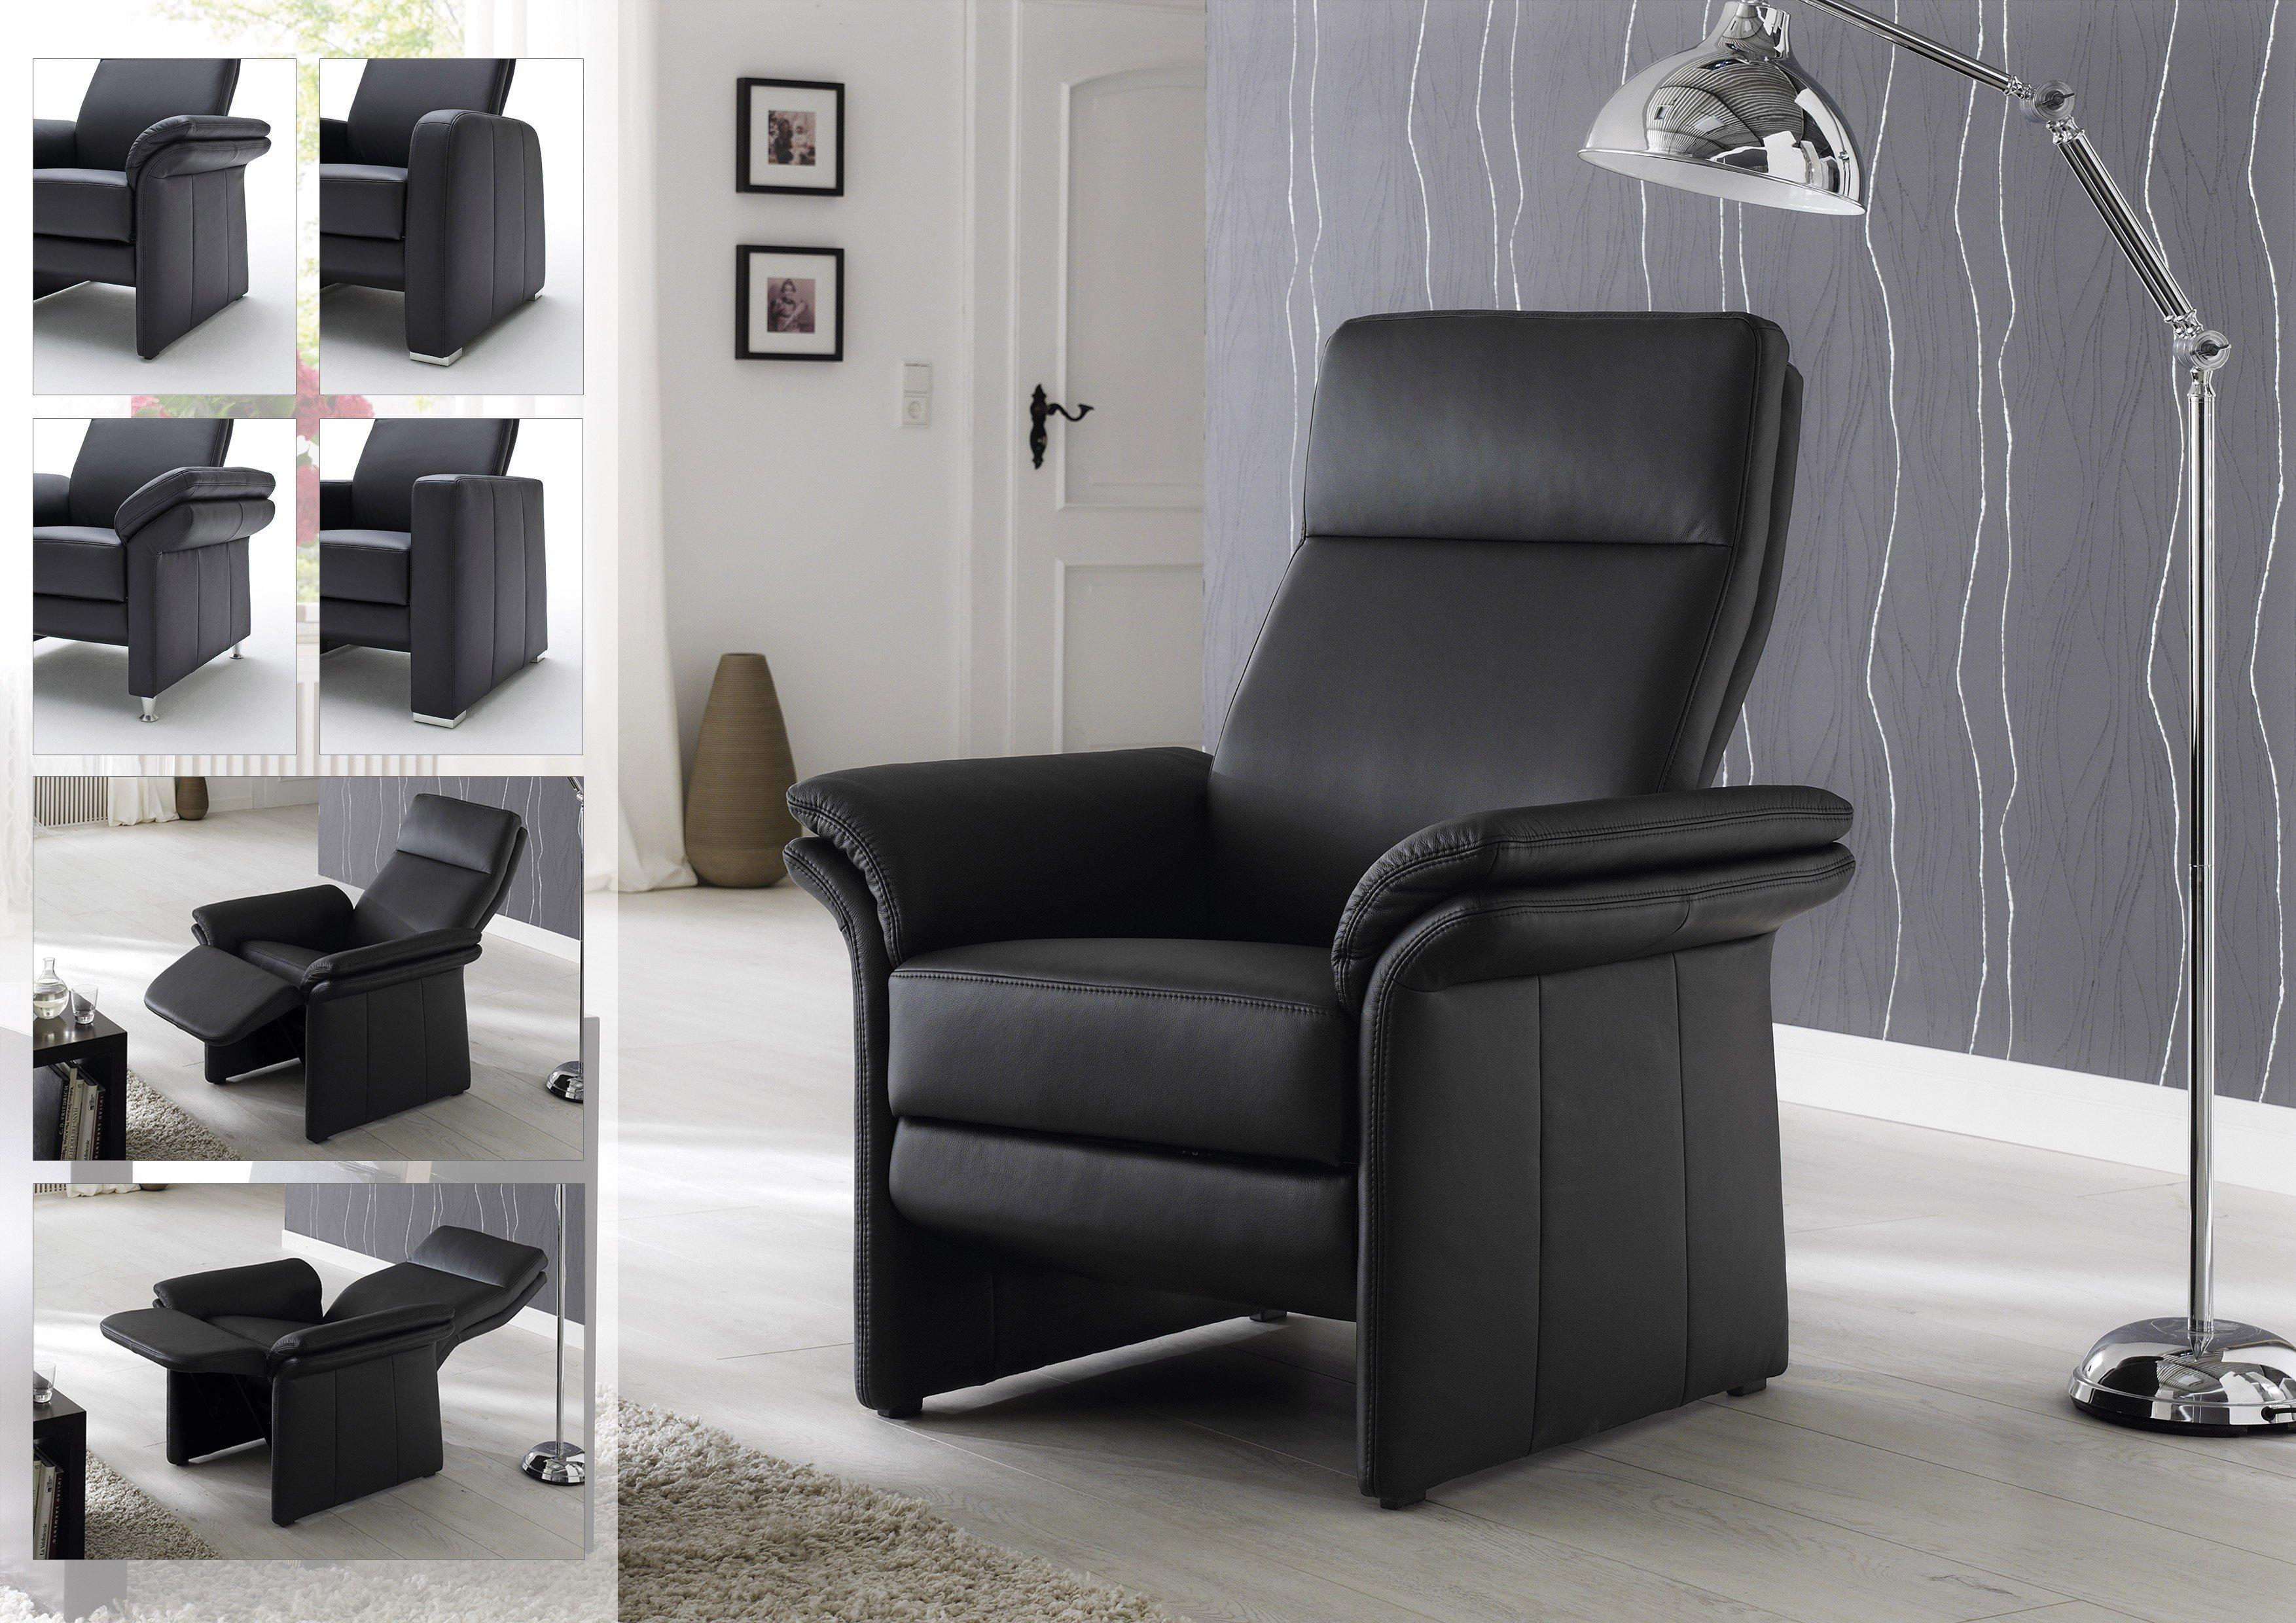 sessel mary in schwarz von carina polsterm bel m bel. Black Bedroom Furniture Sets. Home Design Ideas